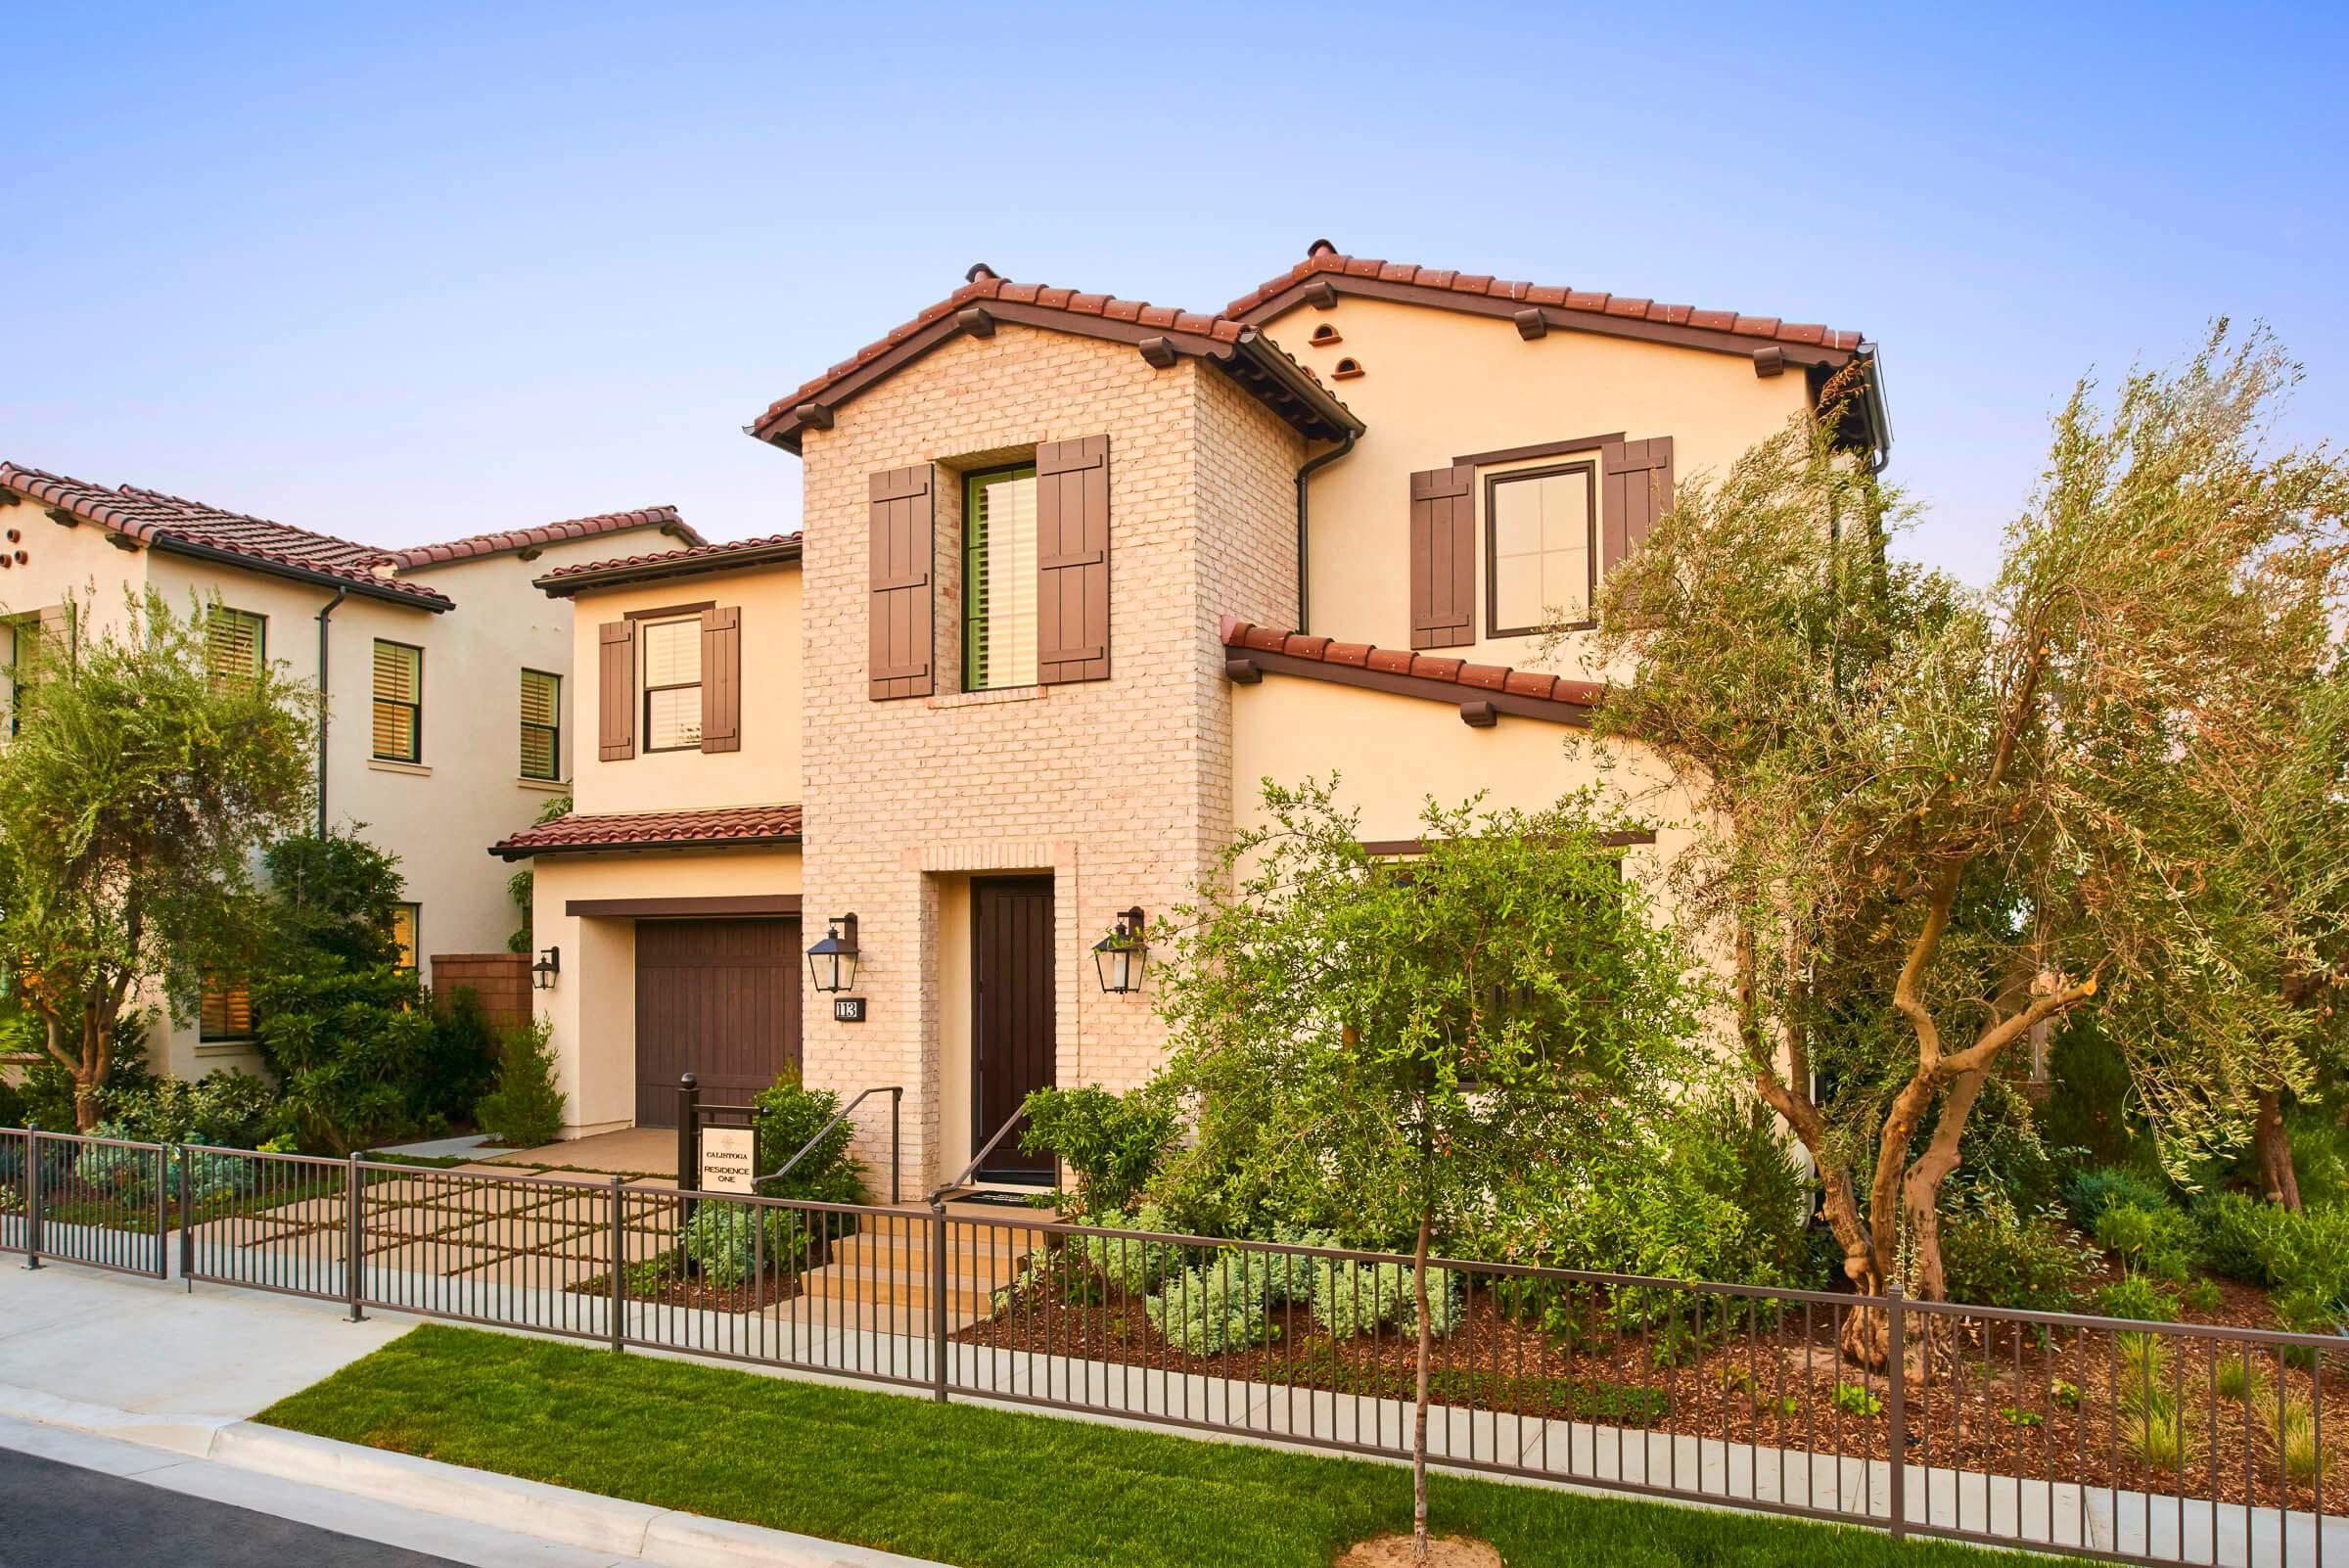 'Single Family' building or community at 'Calistoga at Eastwood Village Irvine, California 92620 United States'